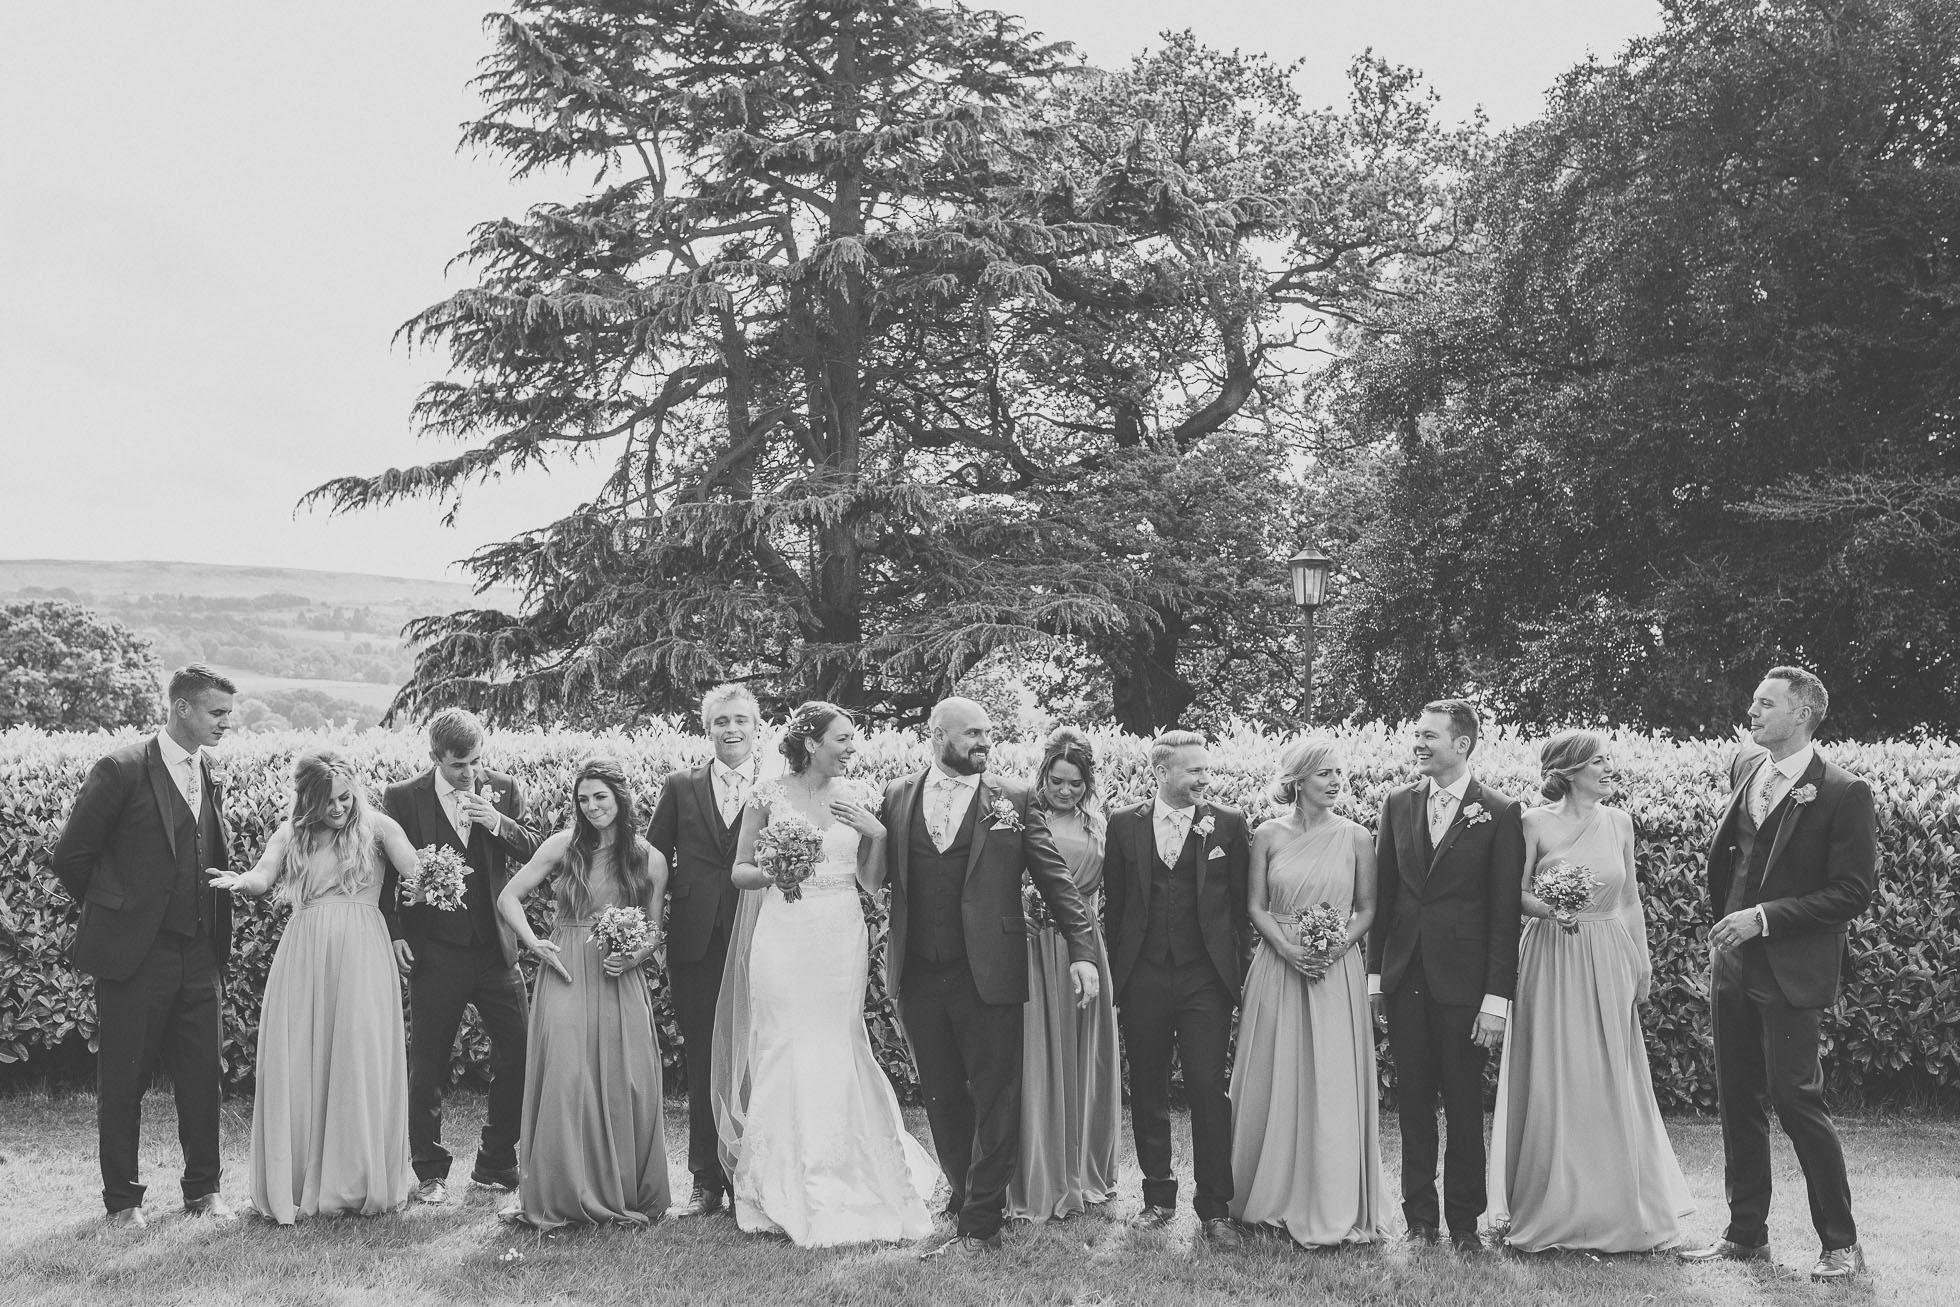 denton-hall-wedding-photographer-44.jpg